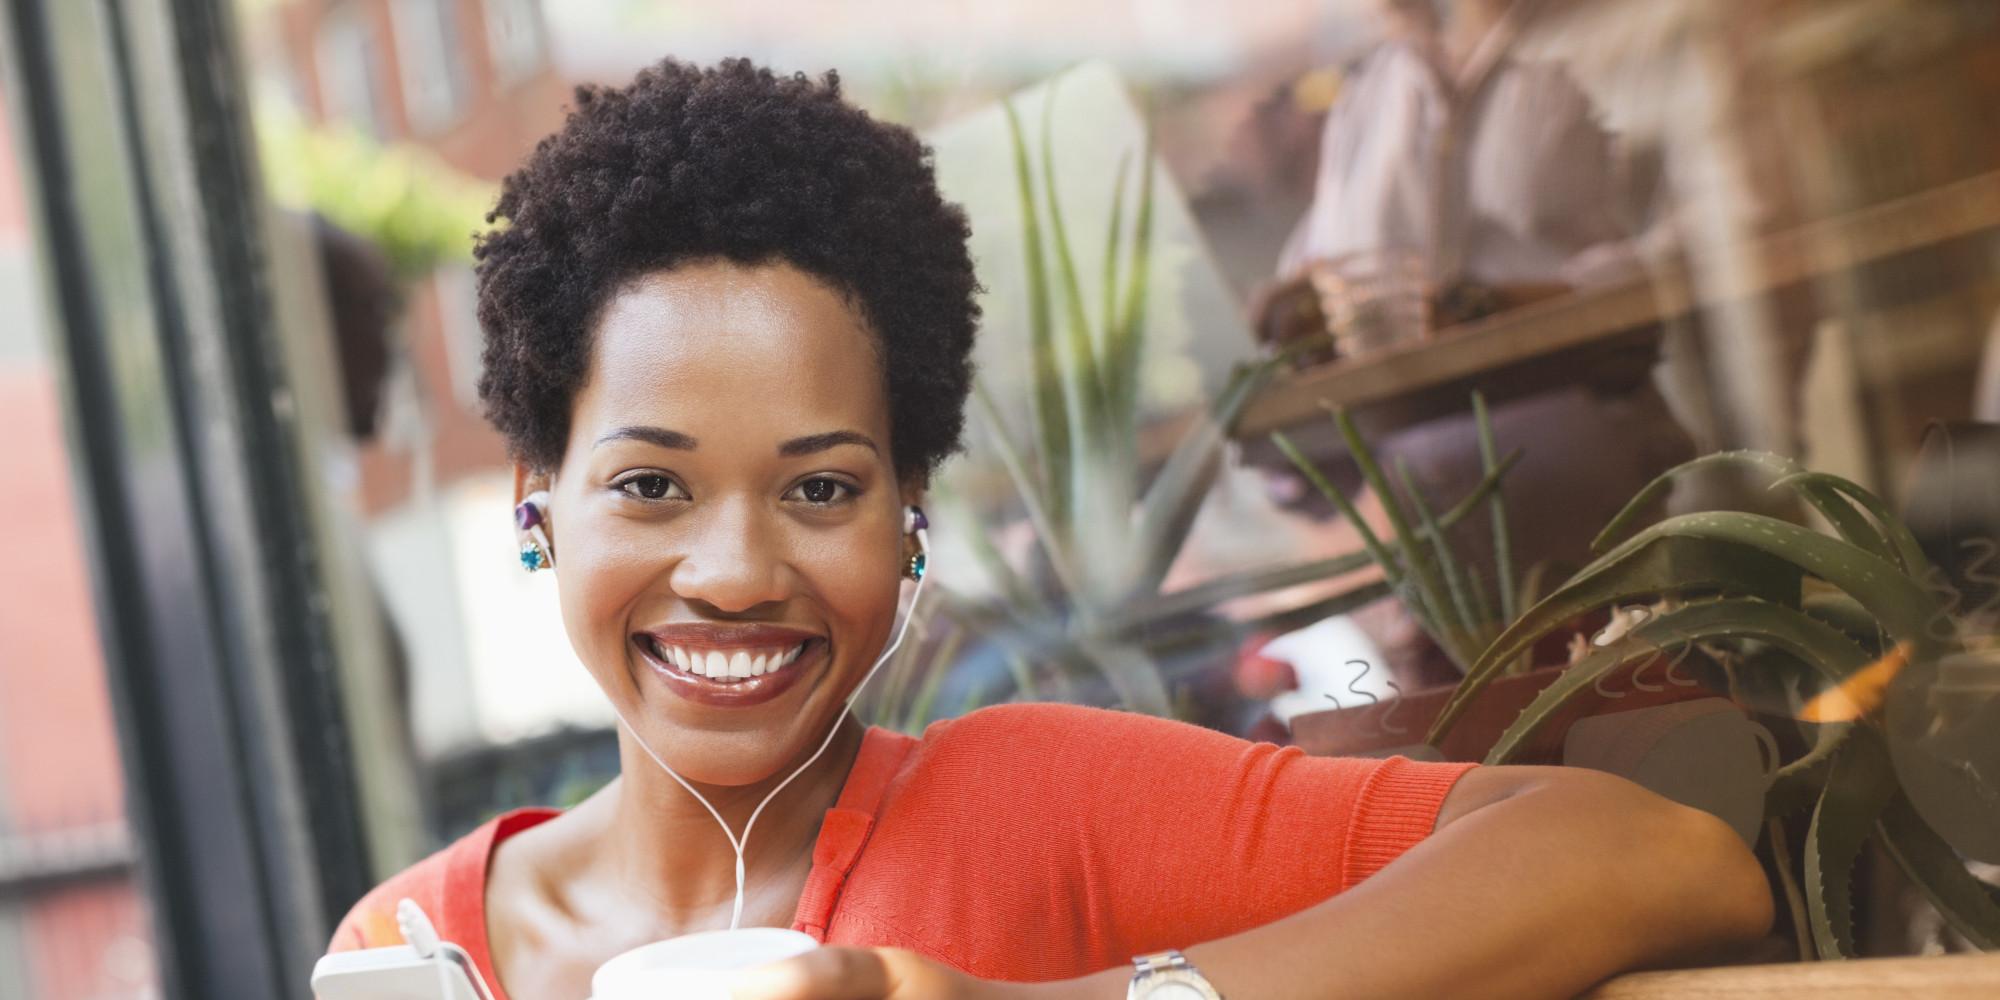 Caramel rhonda young black professional